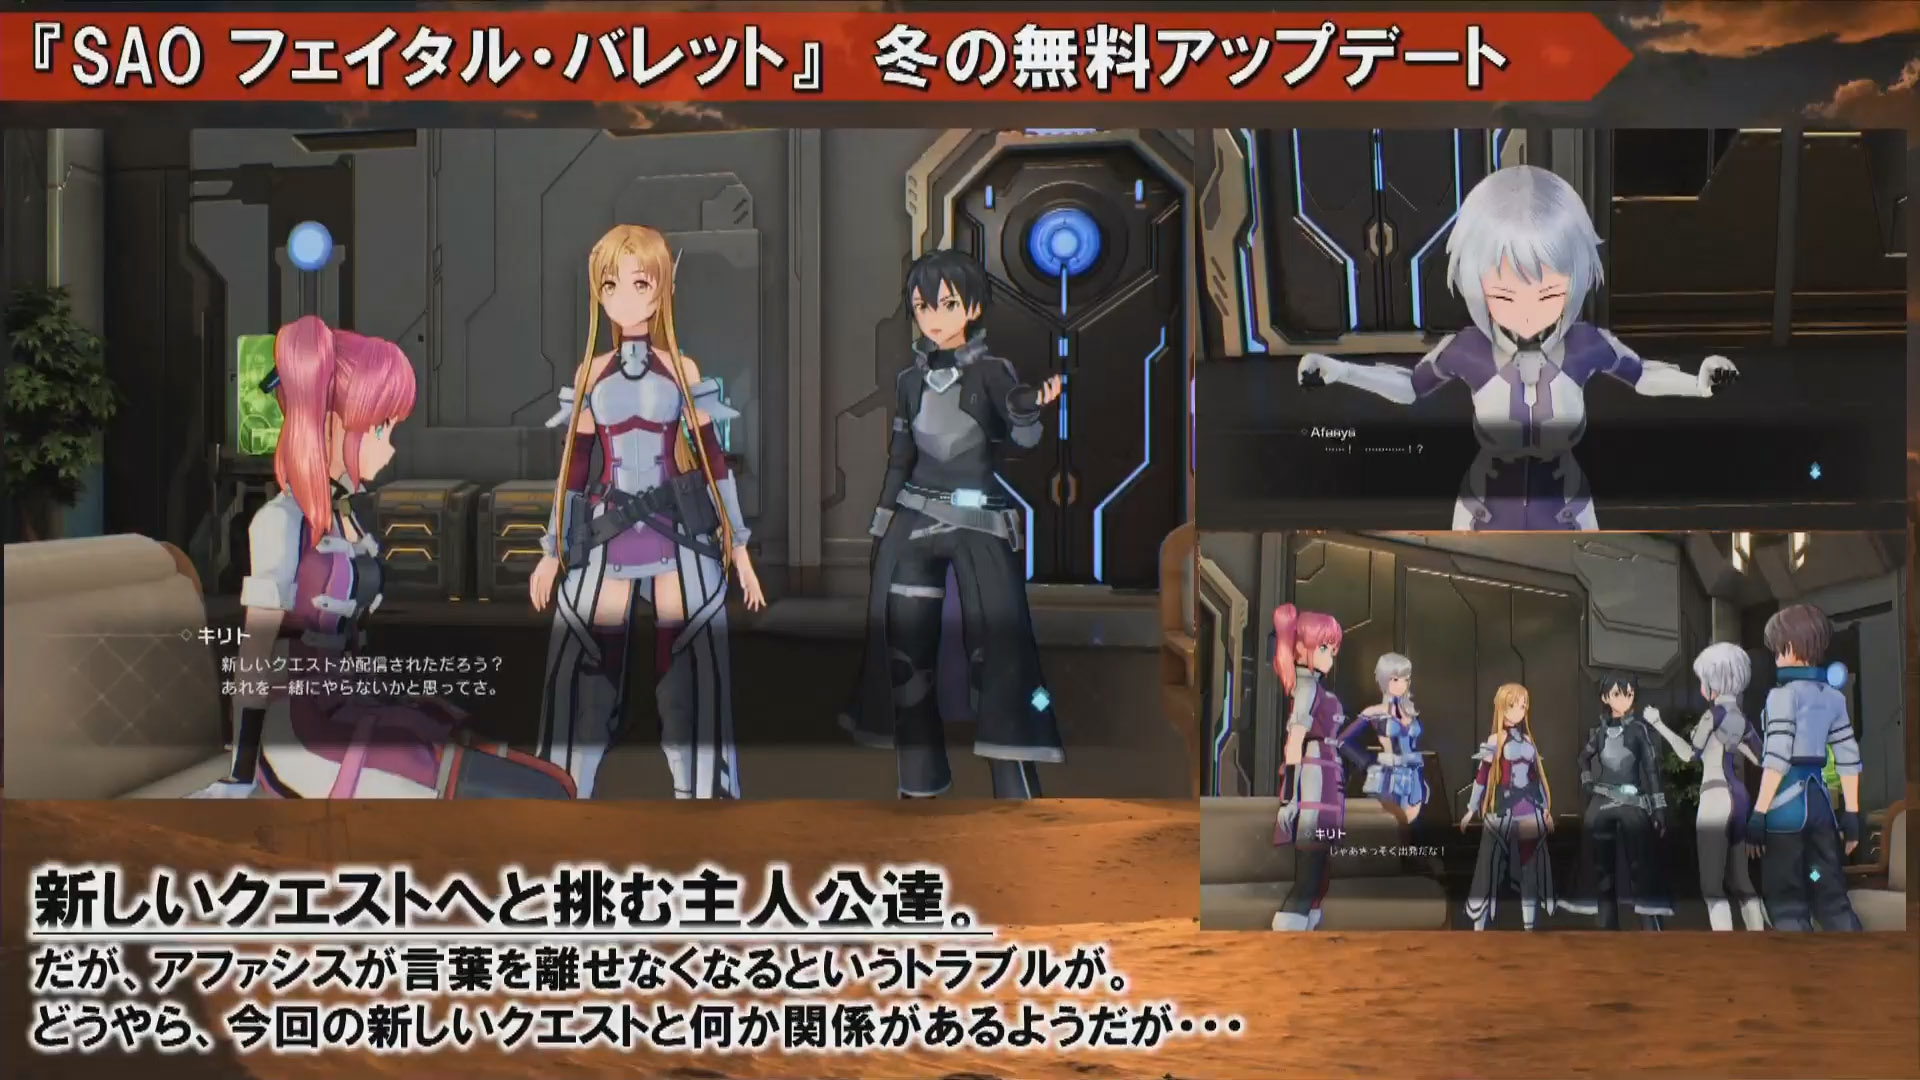 Sword Art Online Fatal Bullet Winter Update Out On February 3